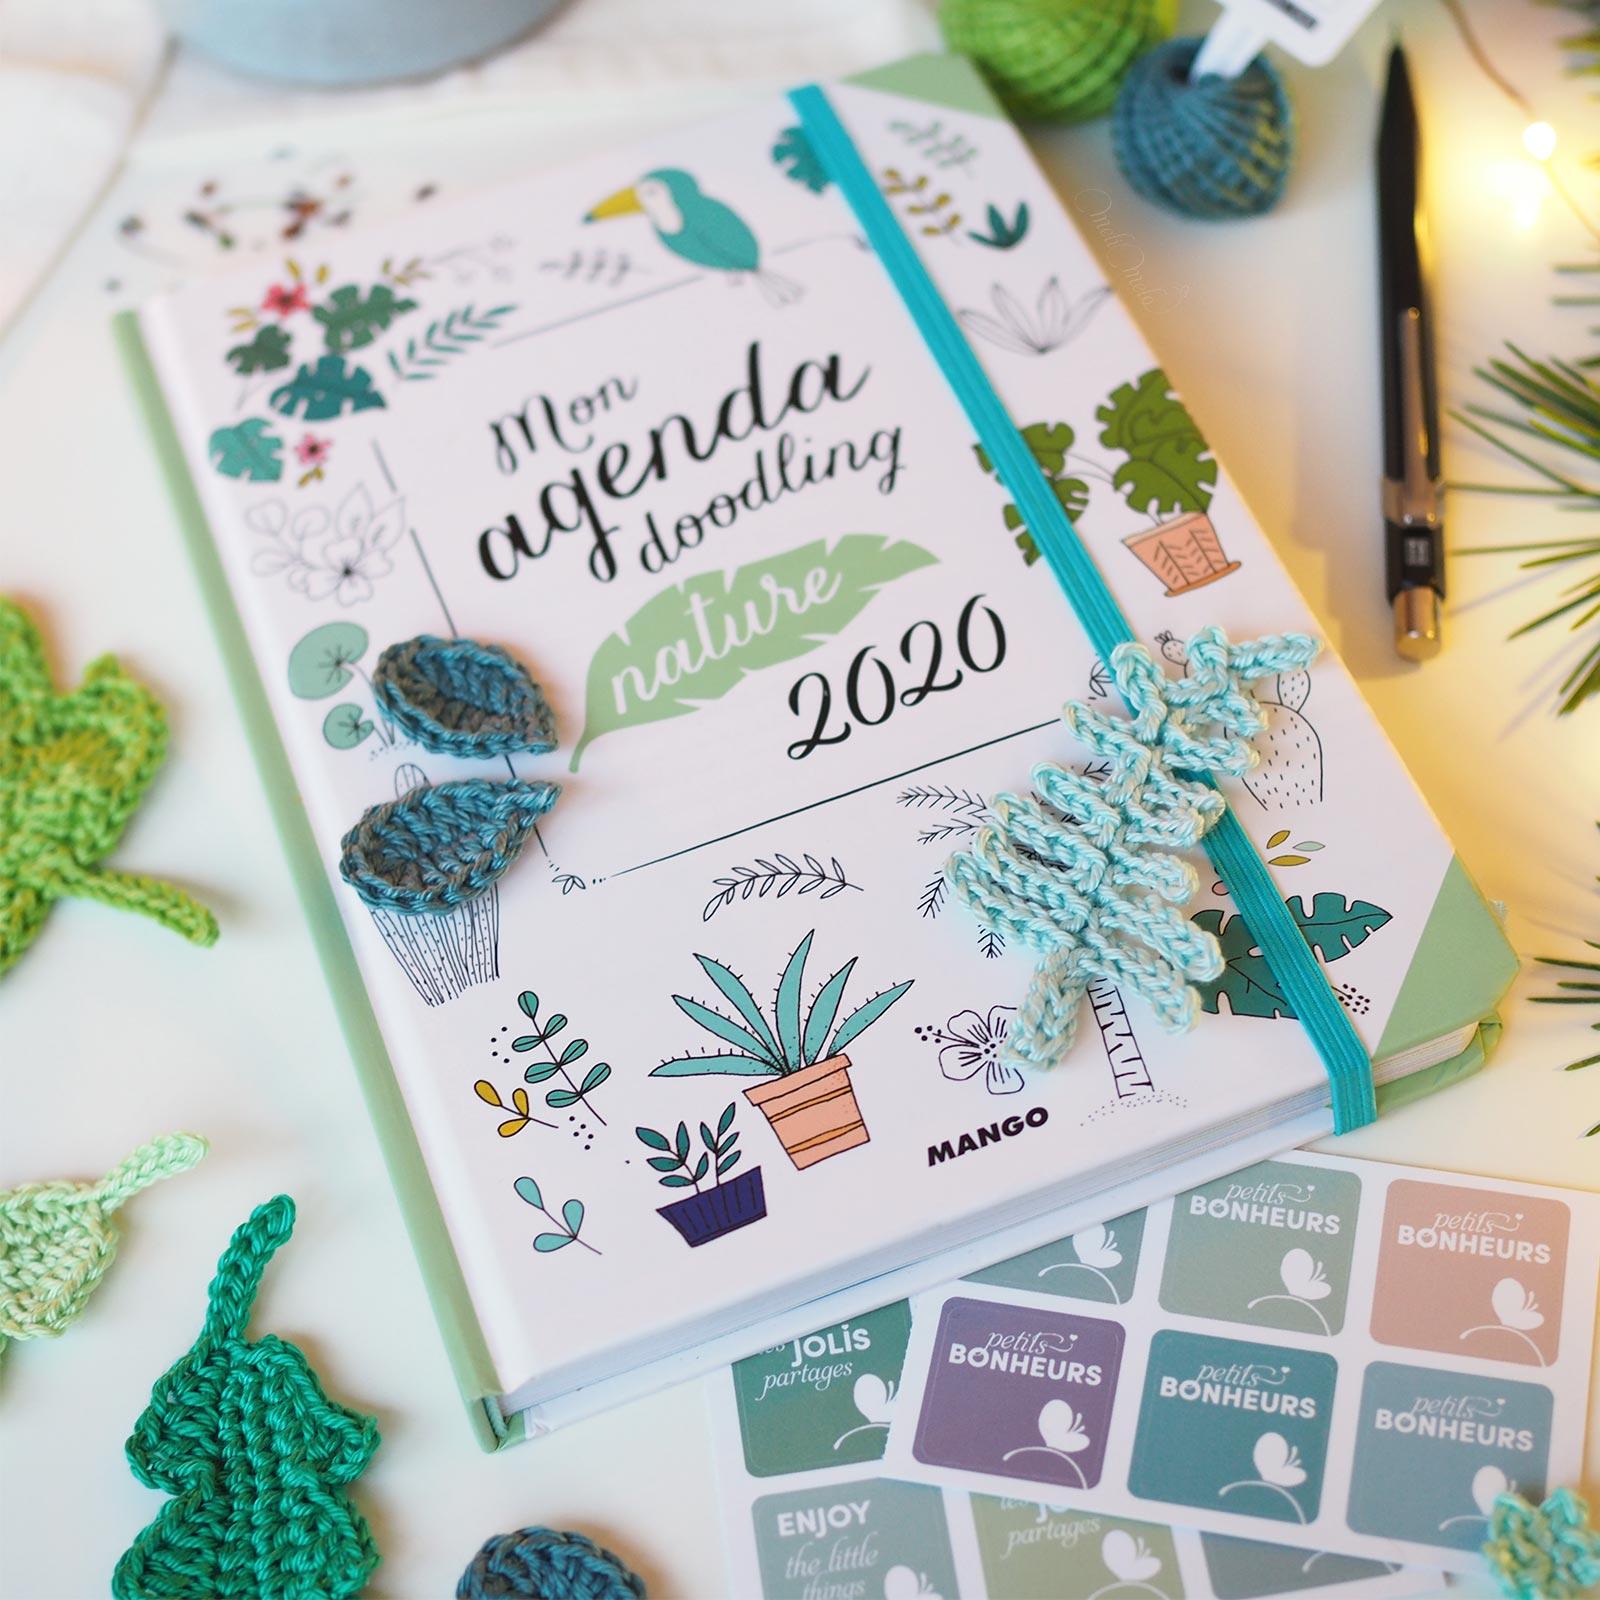 crochet feuille agenda doodling nature 2020 Editions Mango boutique melimelo